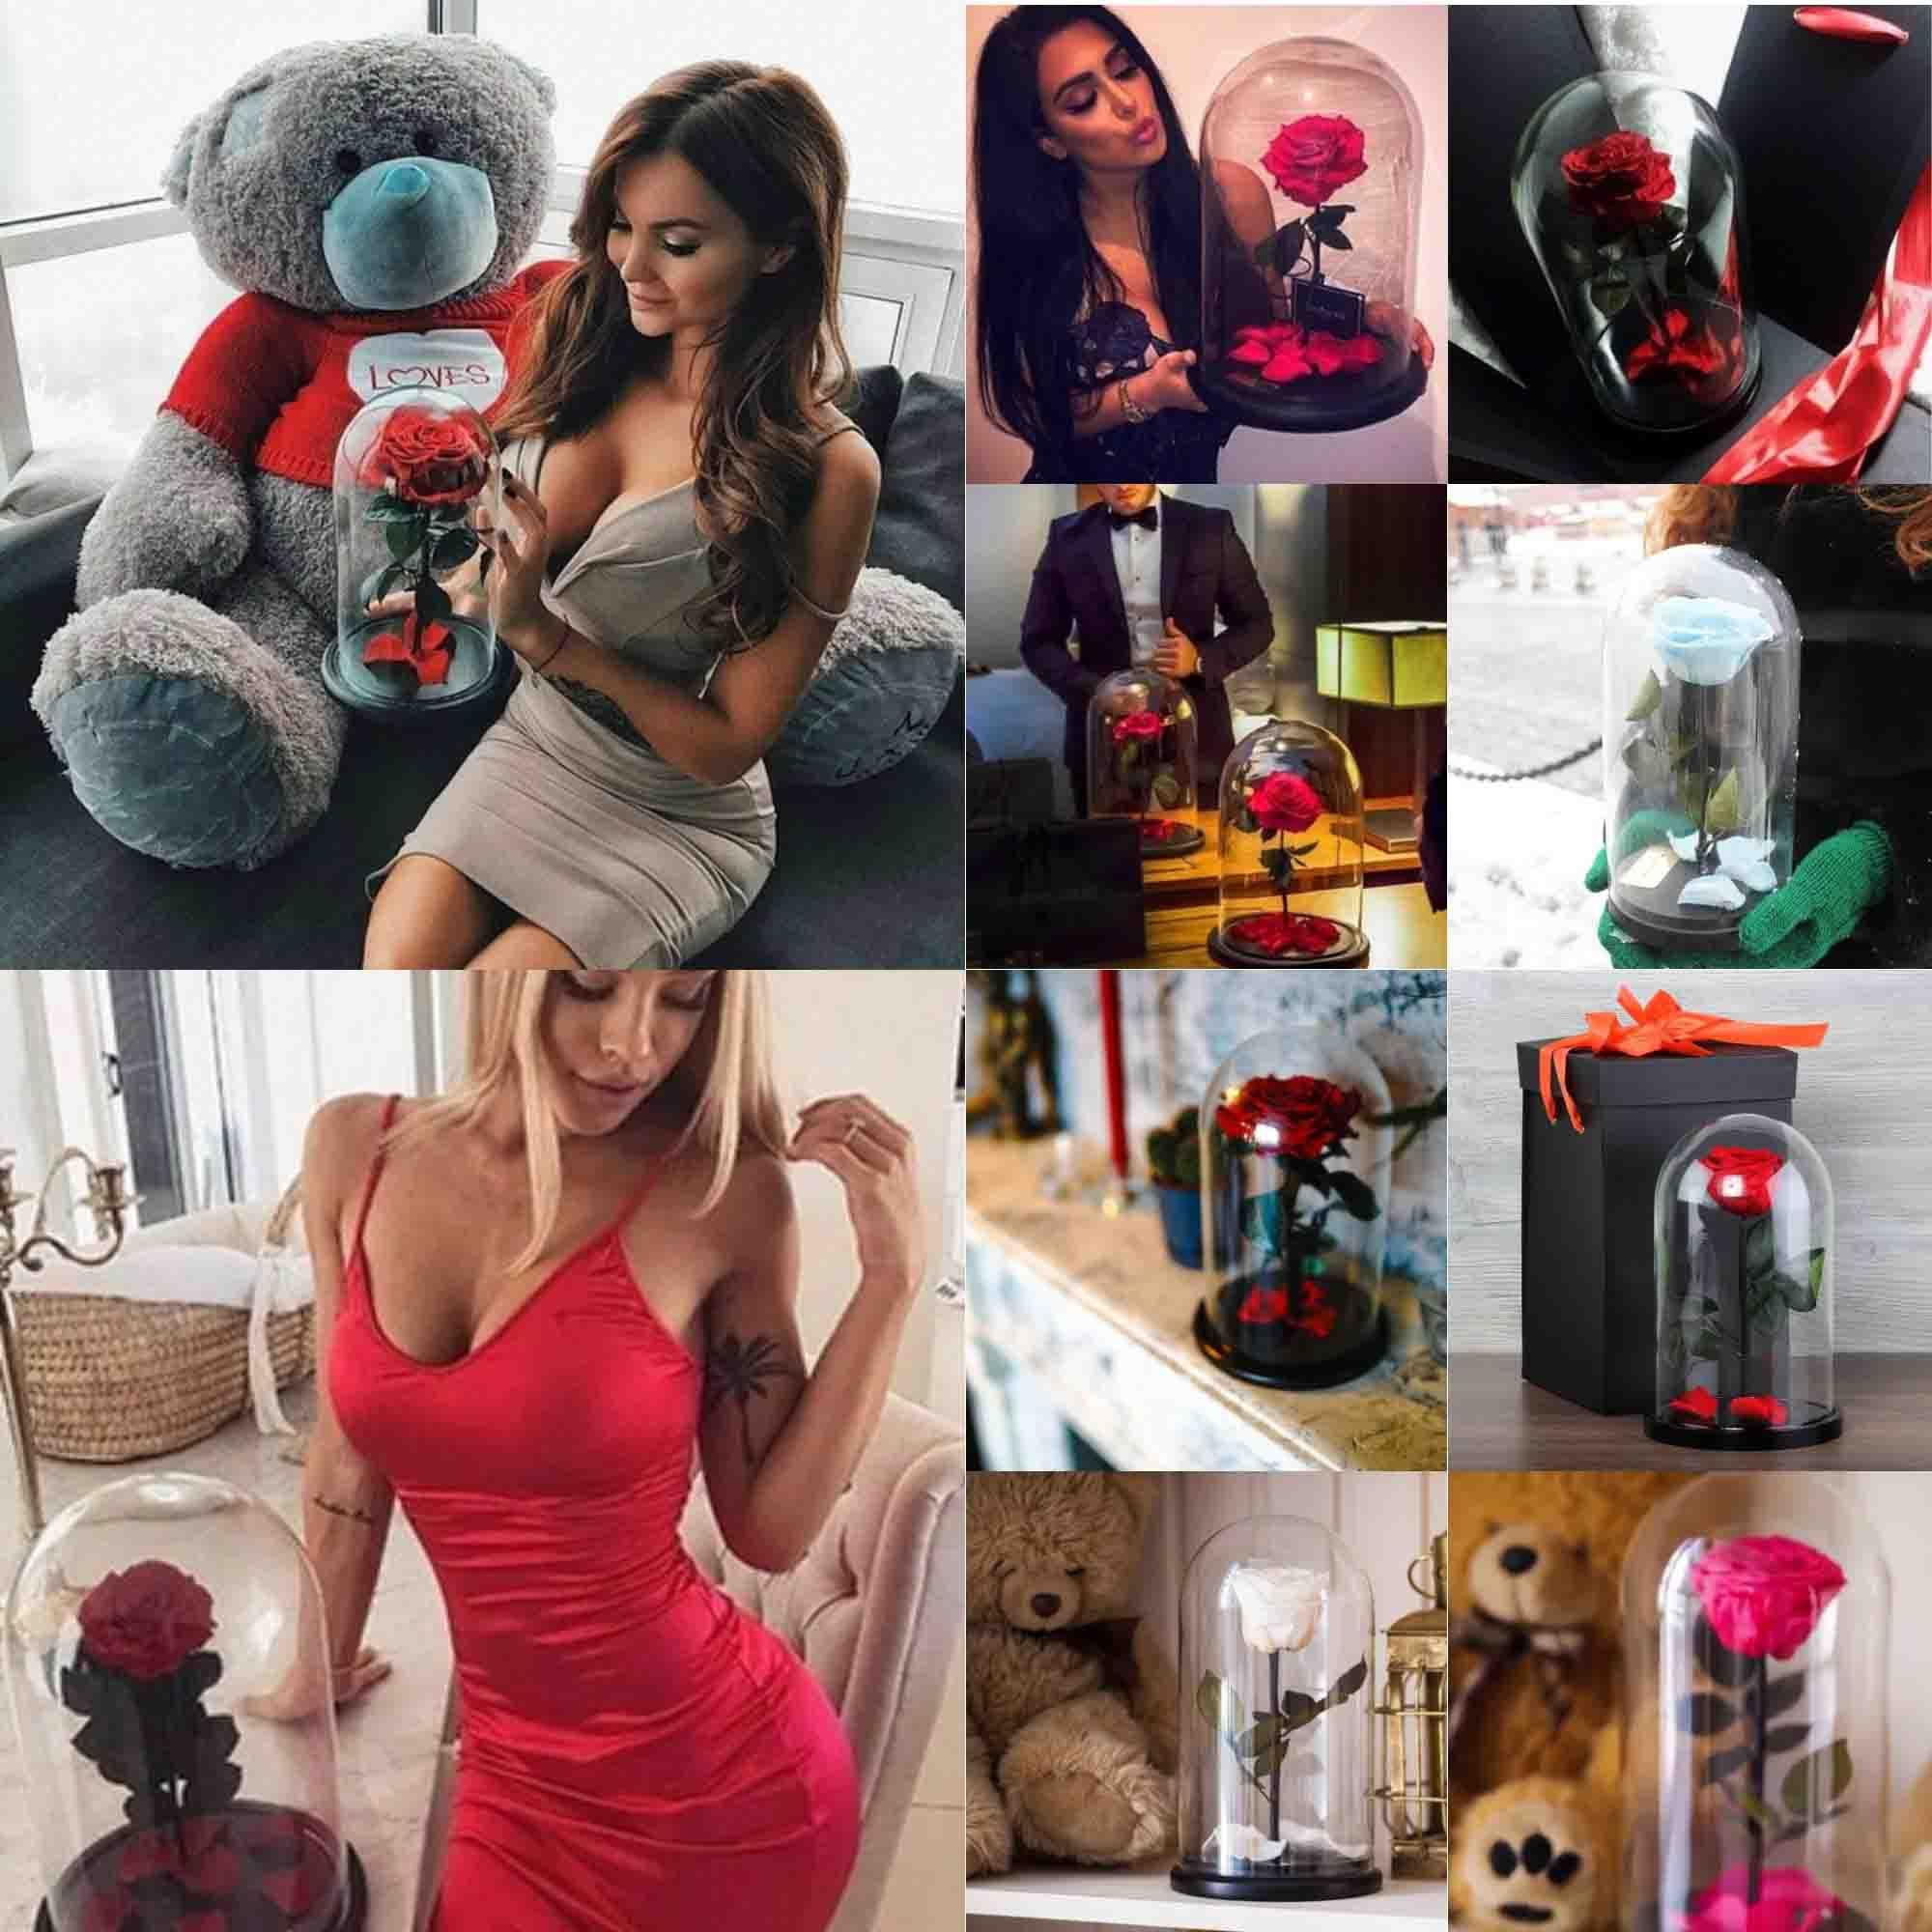 http://bears-teddy.ru/images/upload/Безымянный%20коллаж.jpg